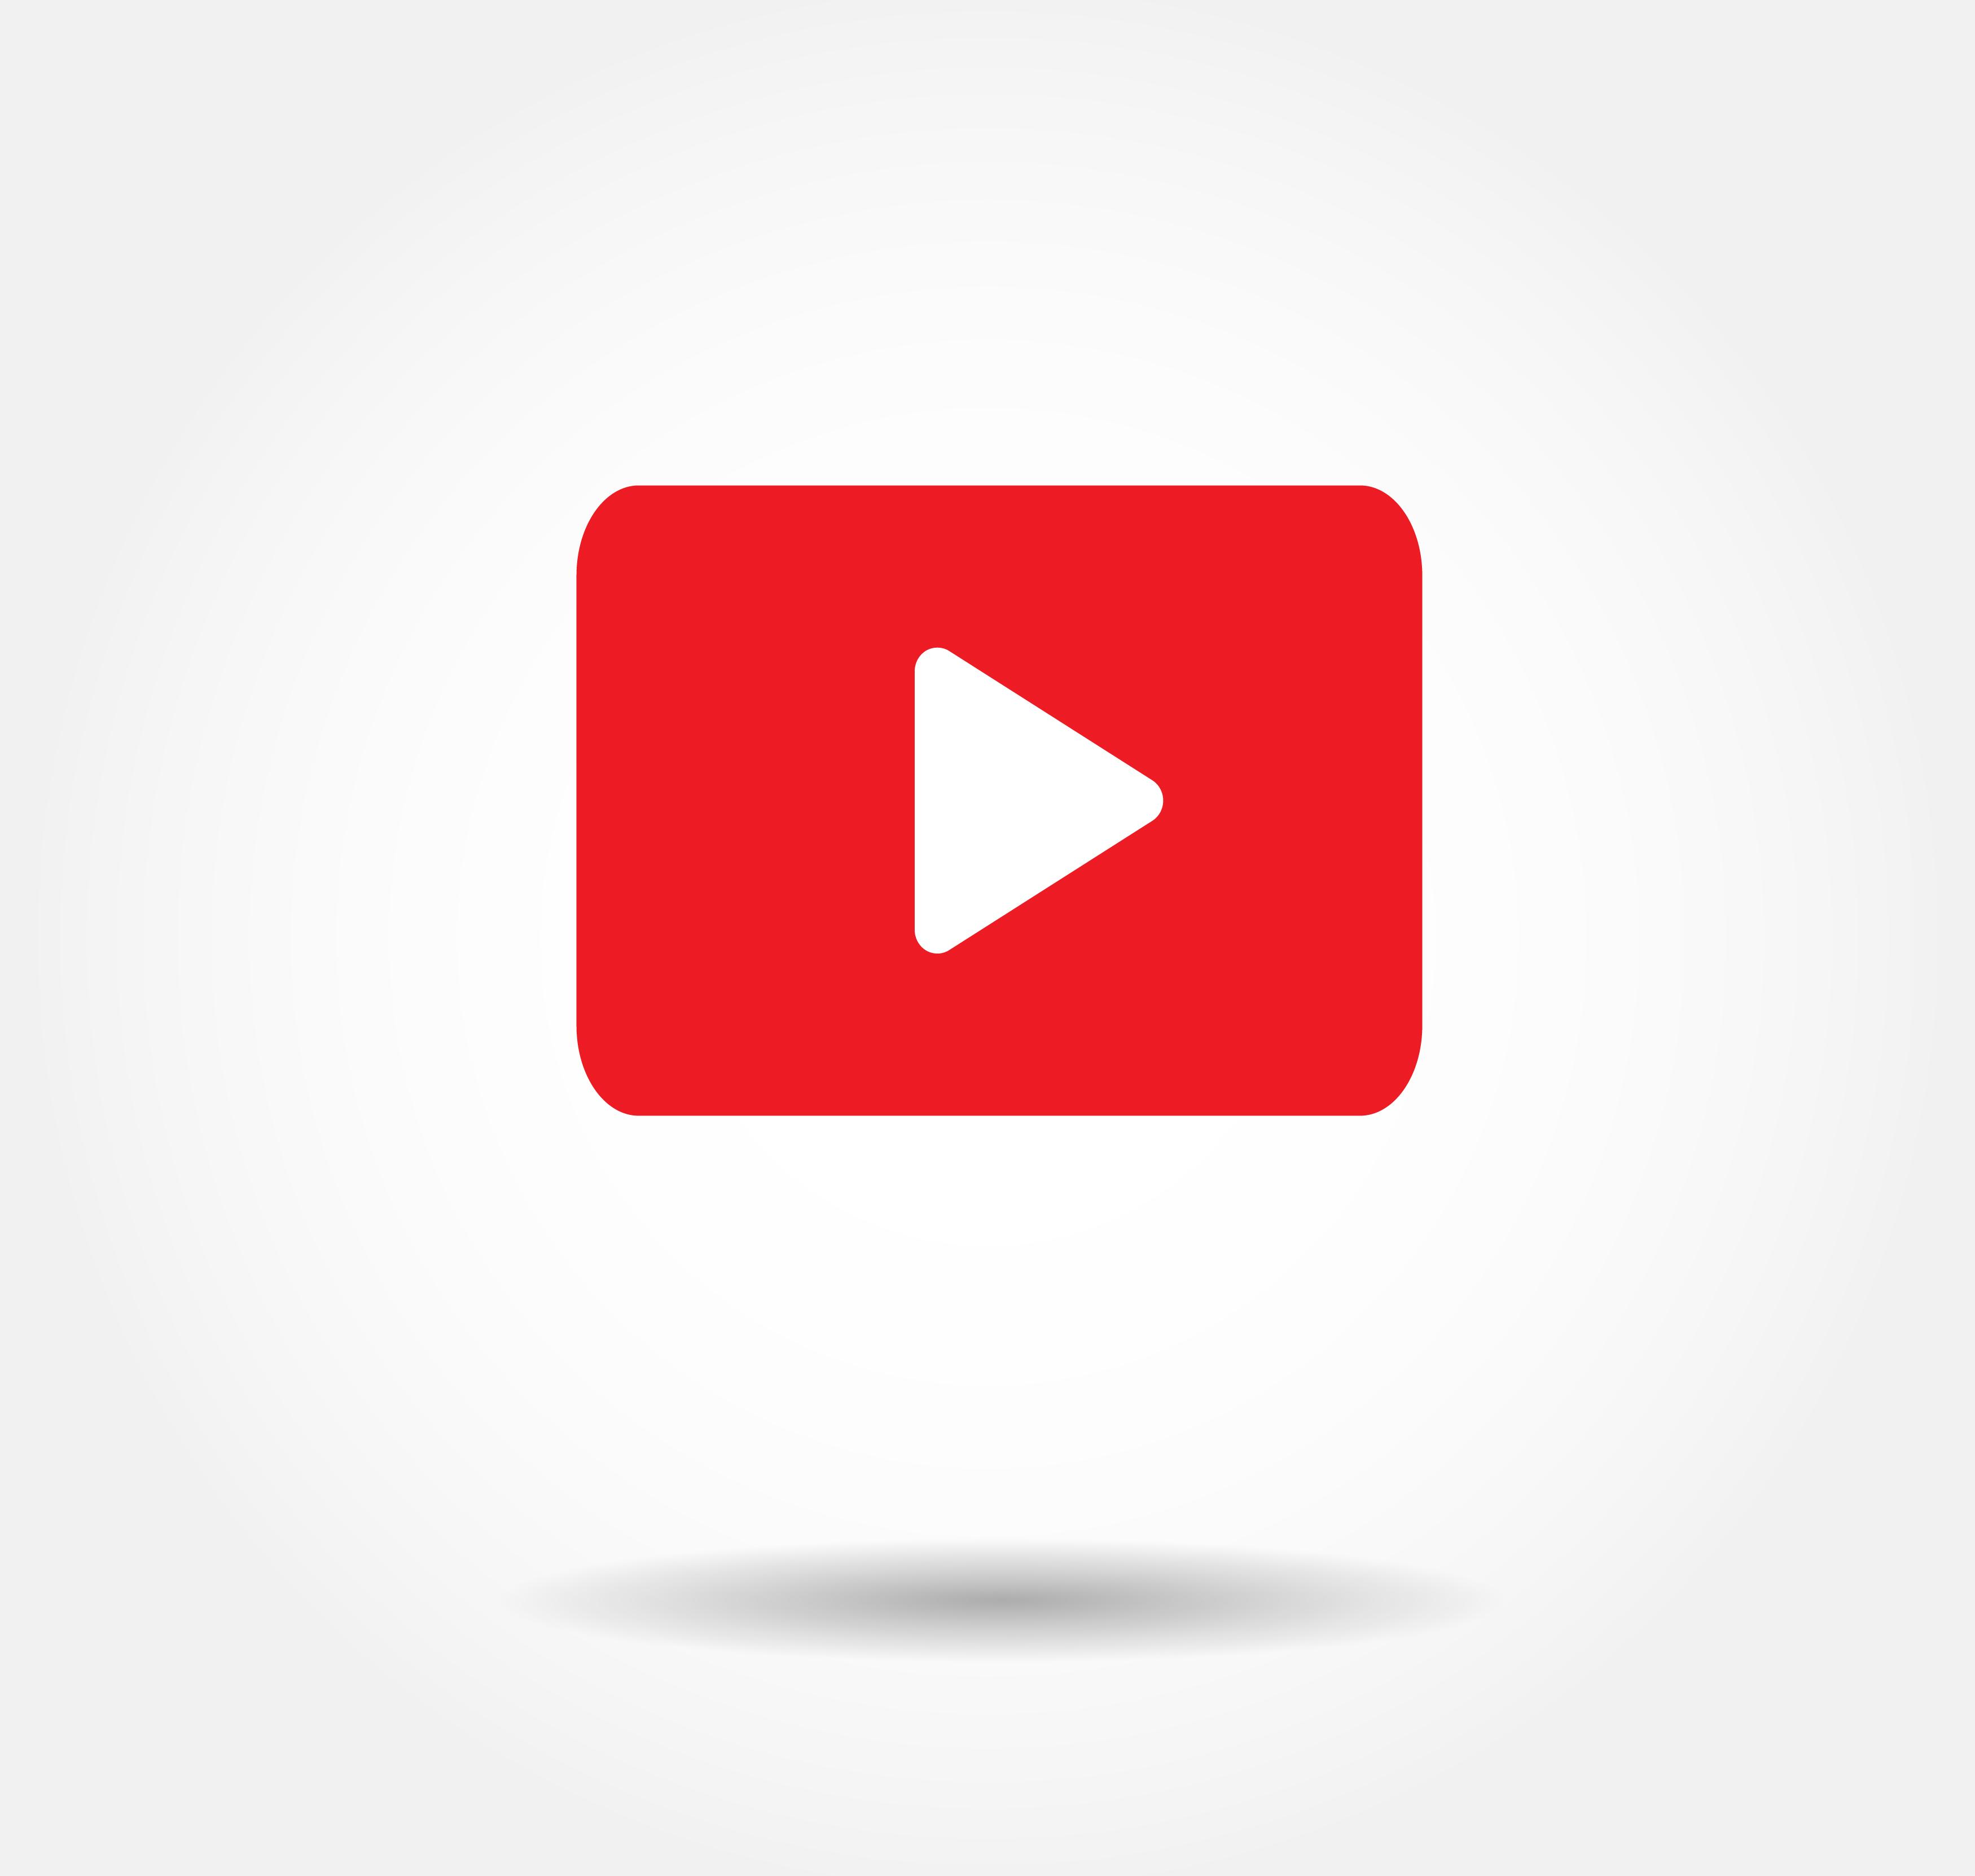 Funny Videos Websites, Websites for Funny Videos, Funny Videos